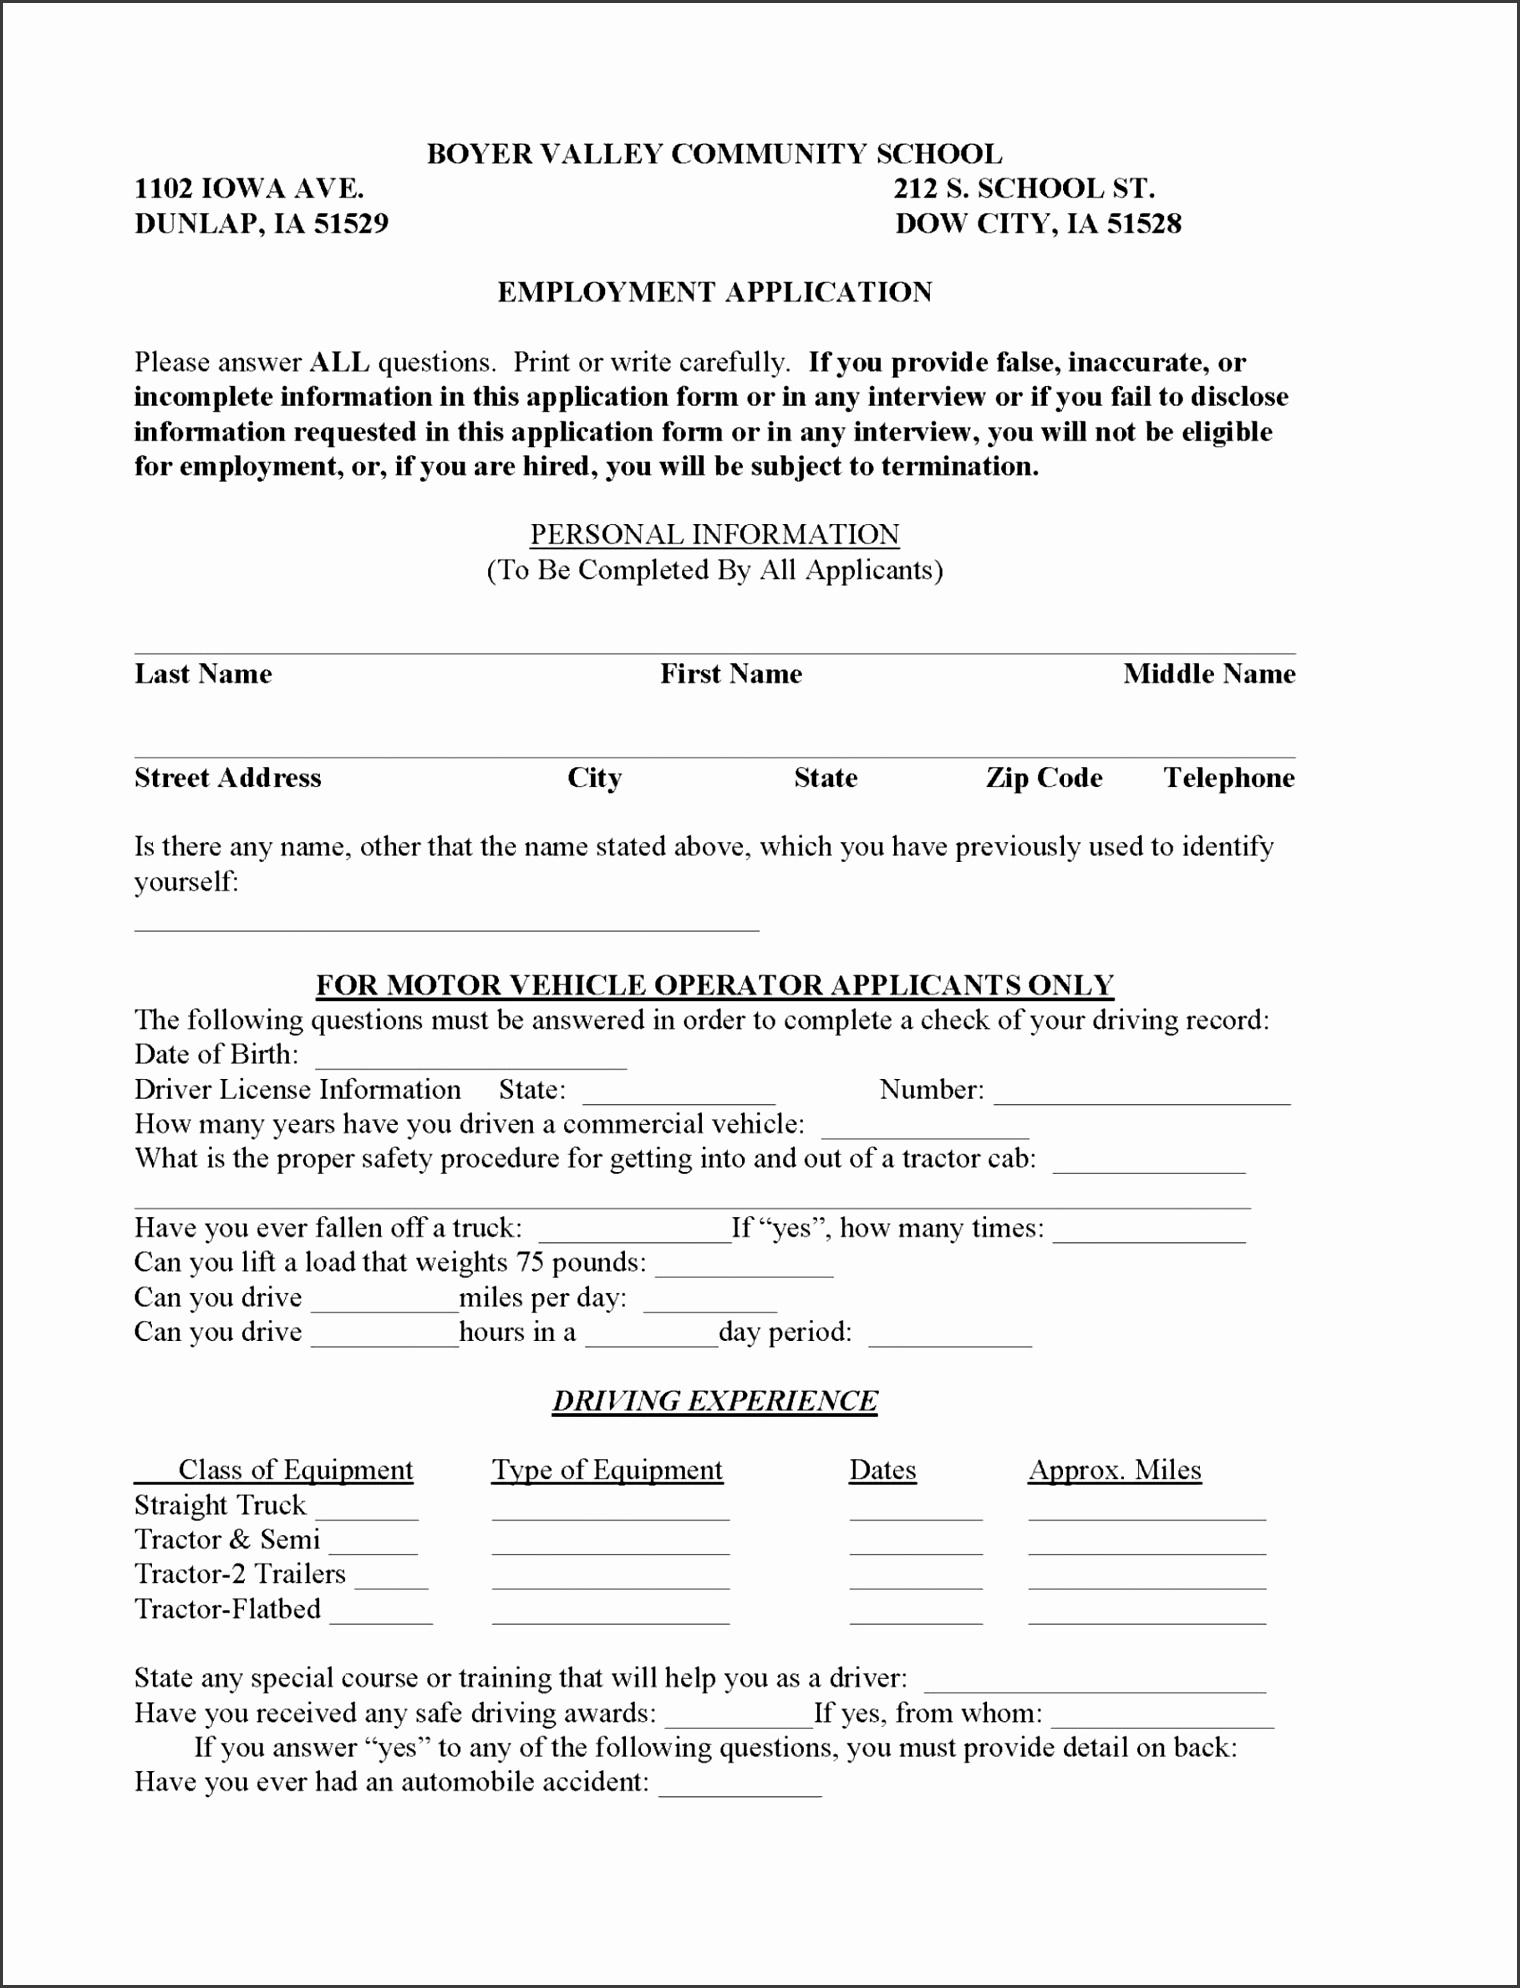 Employee Termination Checklist Checklists Registration Template Word Letter School Form Employment Massachusetts Templates 1600